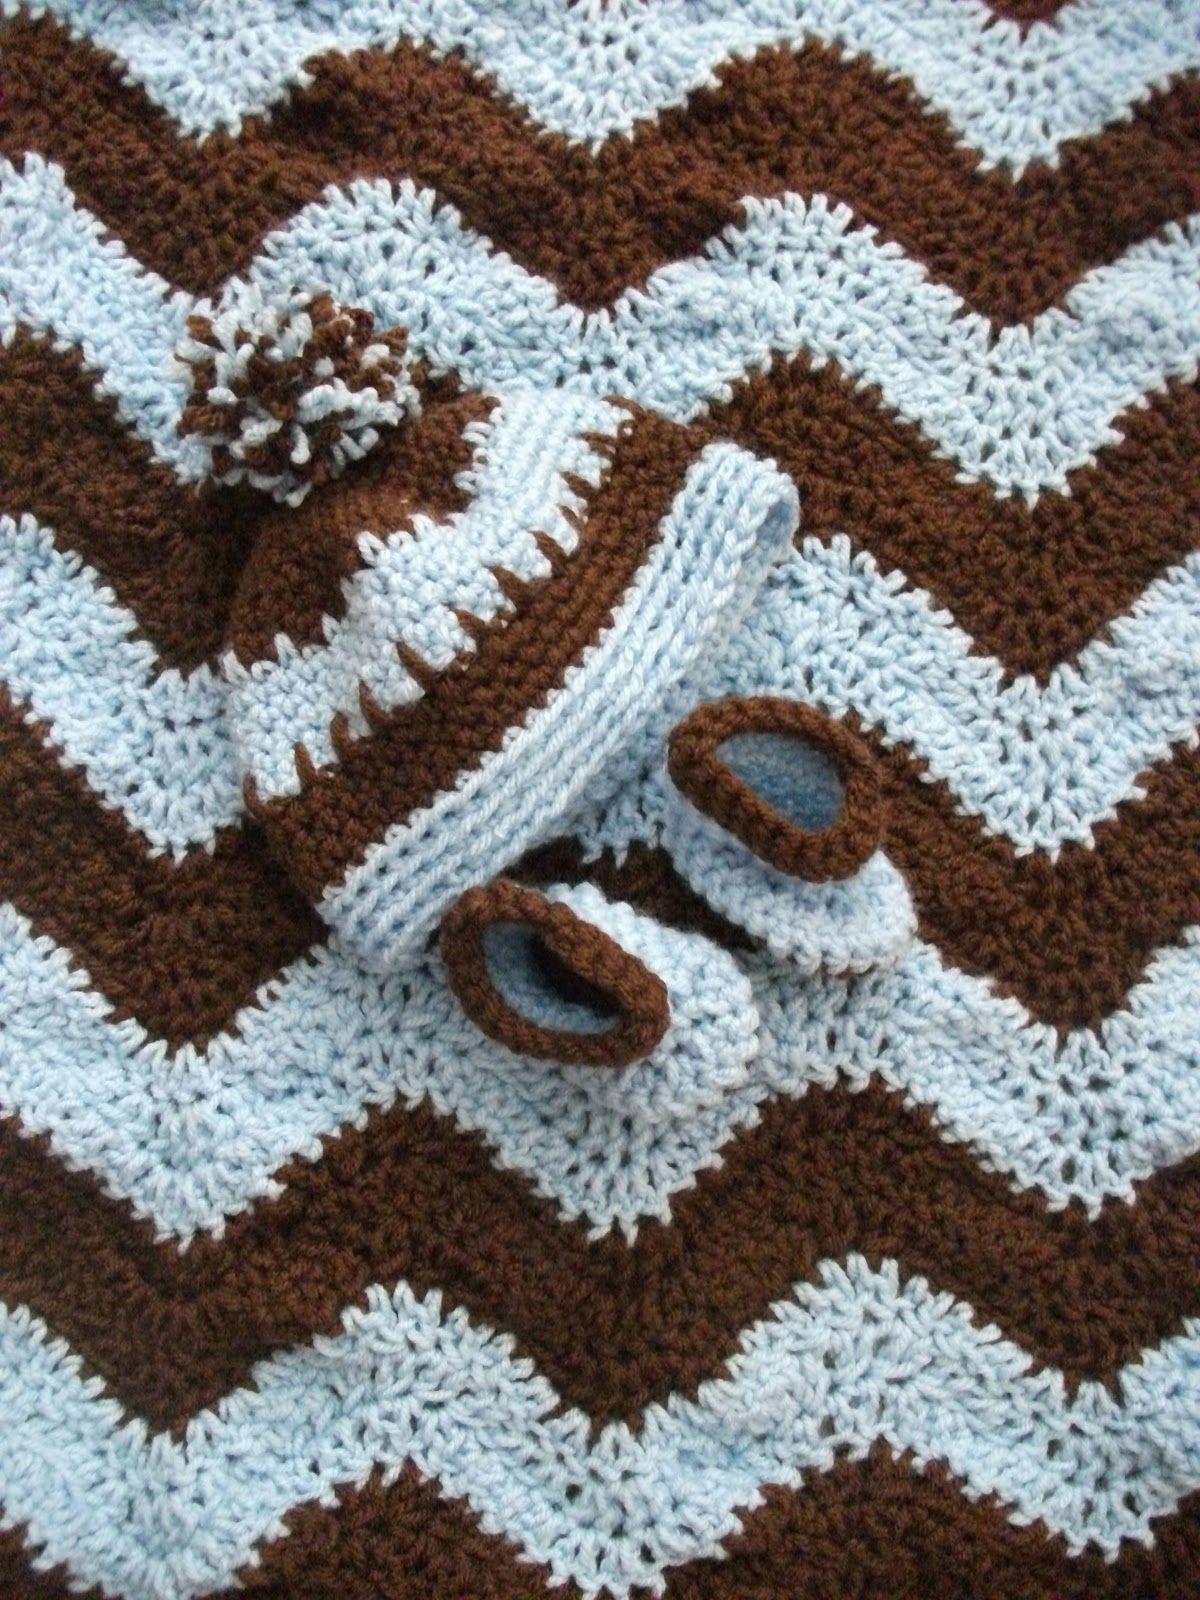 40 free crochet ripple afghan patterns lapghans baby blankets 40 free crochet ripple afghan patterns lapghans baby blankets bankloansurffo Choice Image